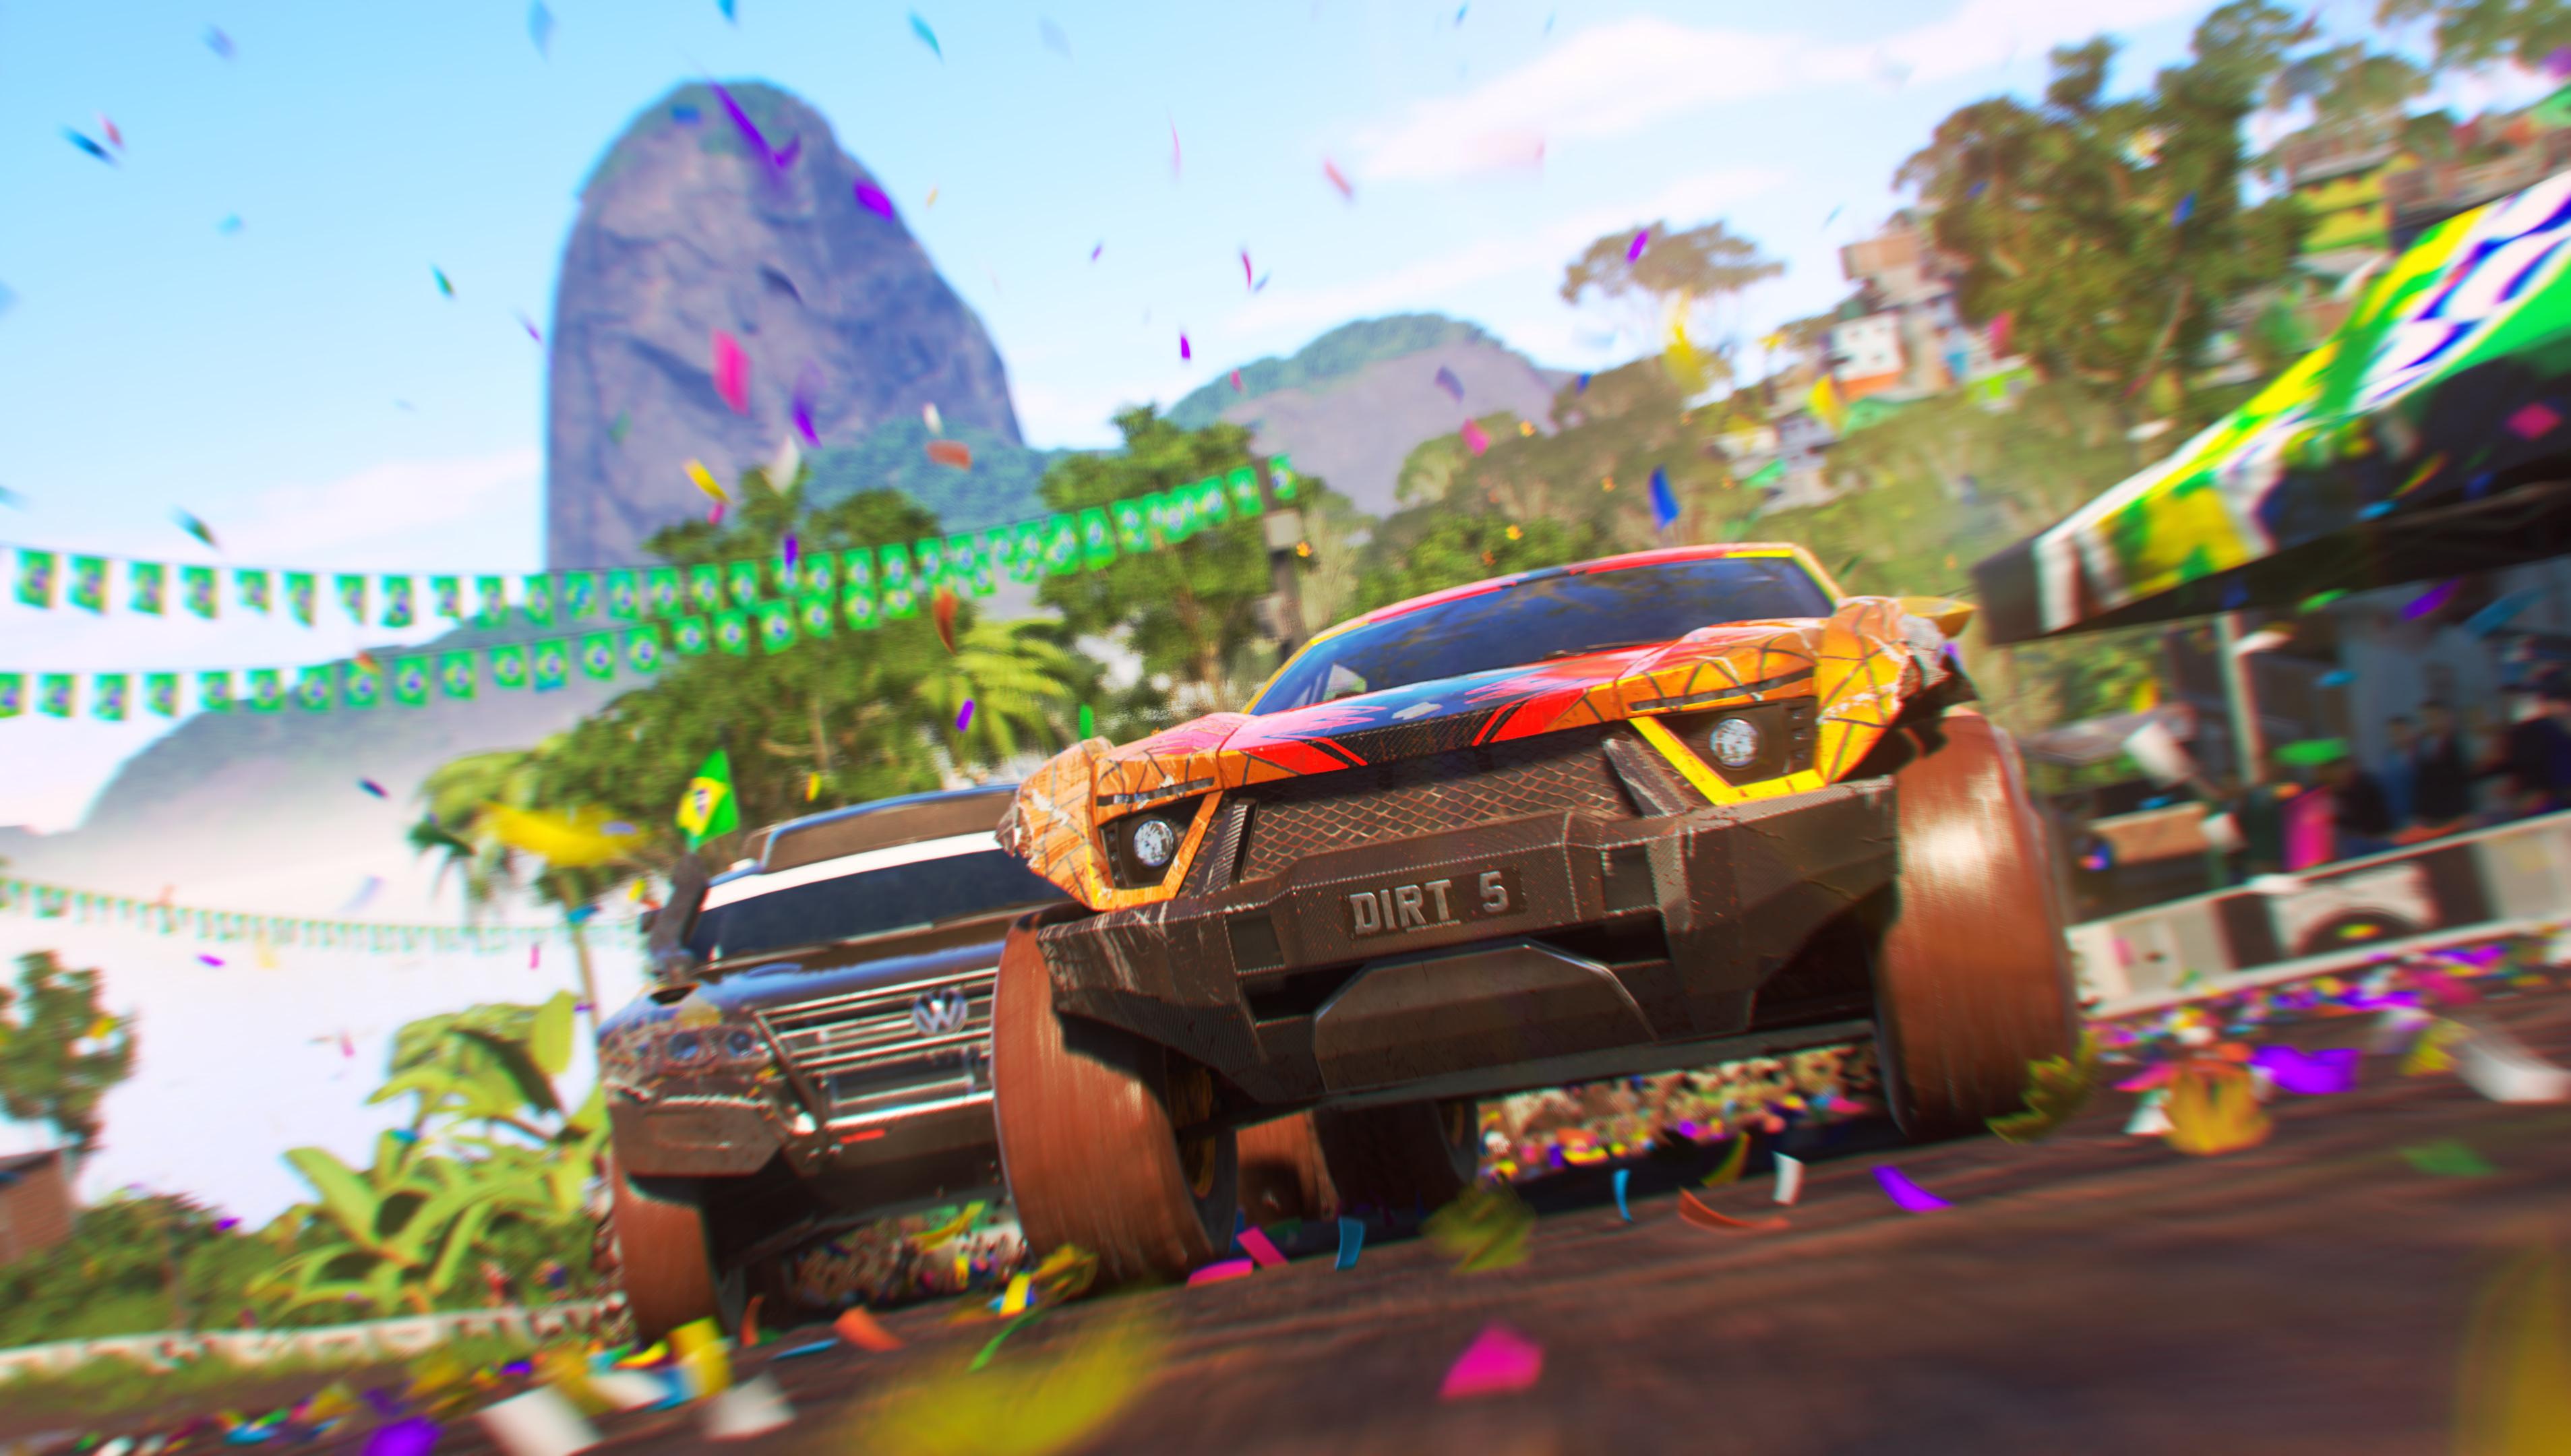 Review: DIRT 5 - Dirty Racing - XboxEra